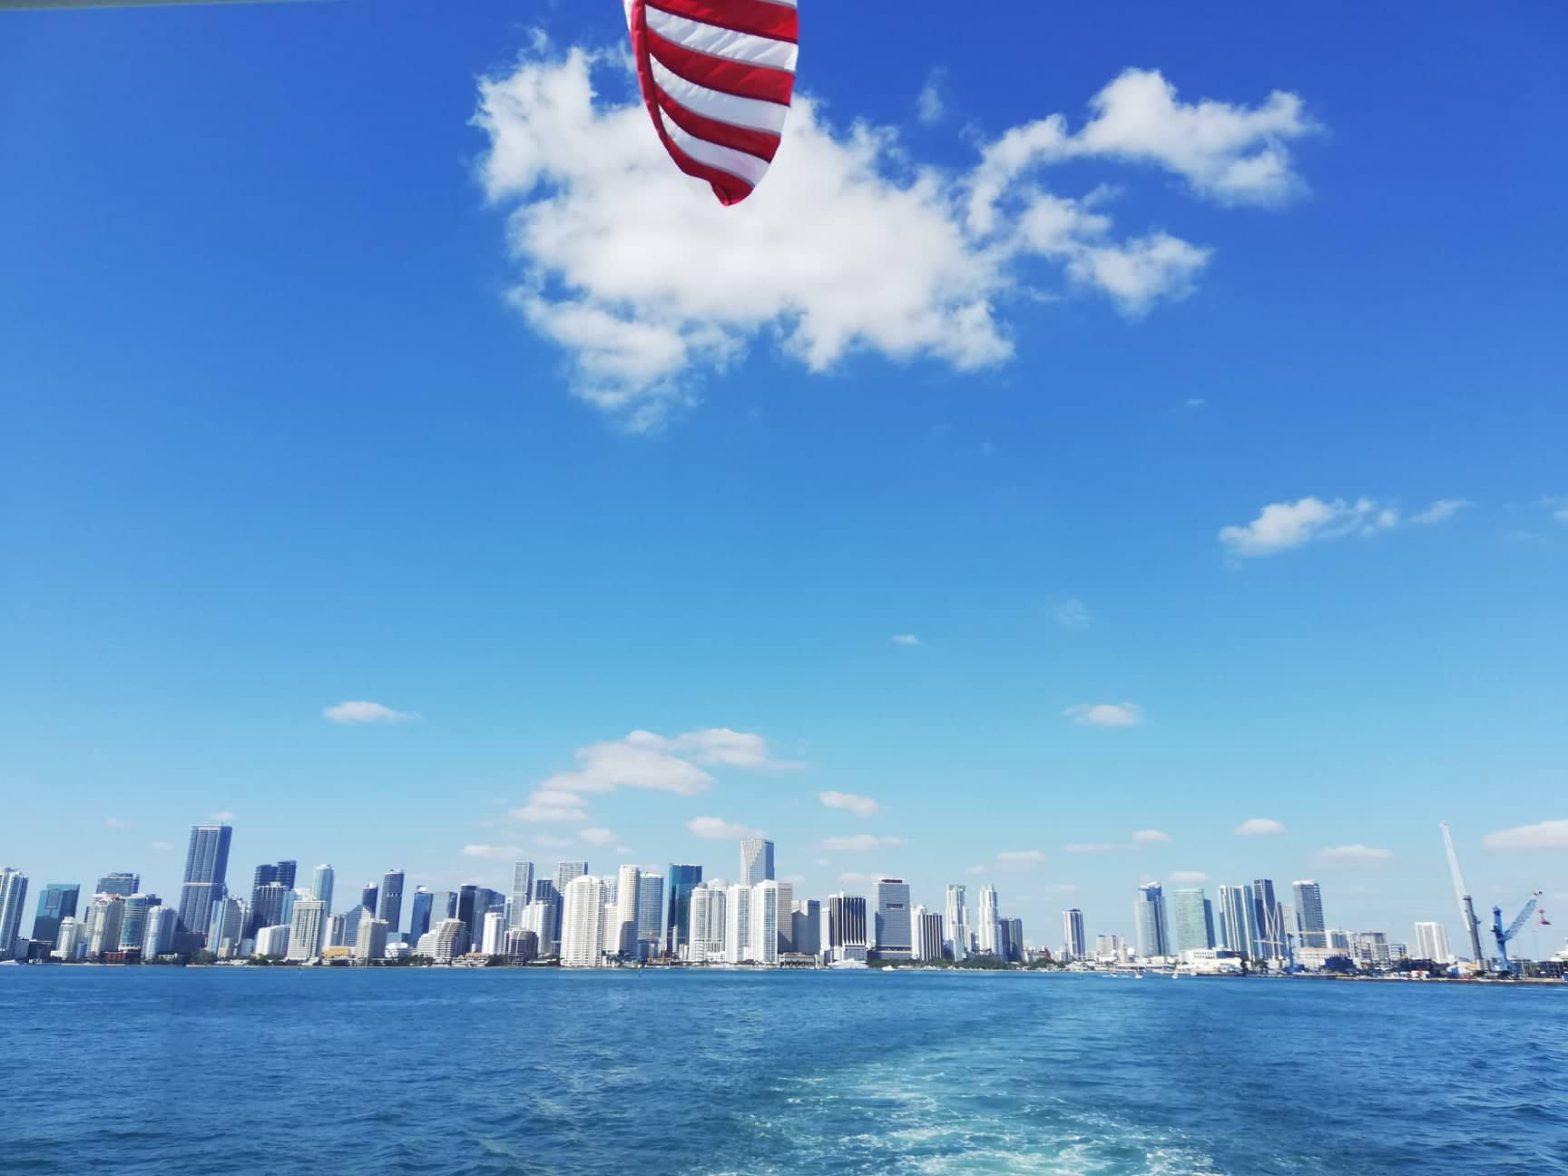 Millionaire's Row cruise Miami Skyline